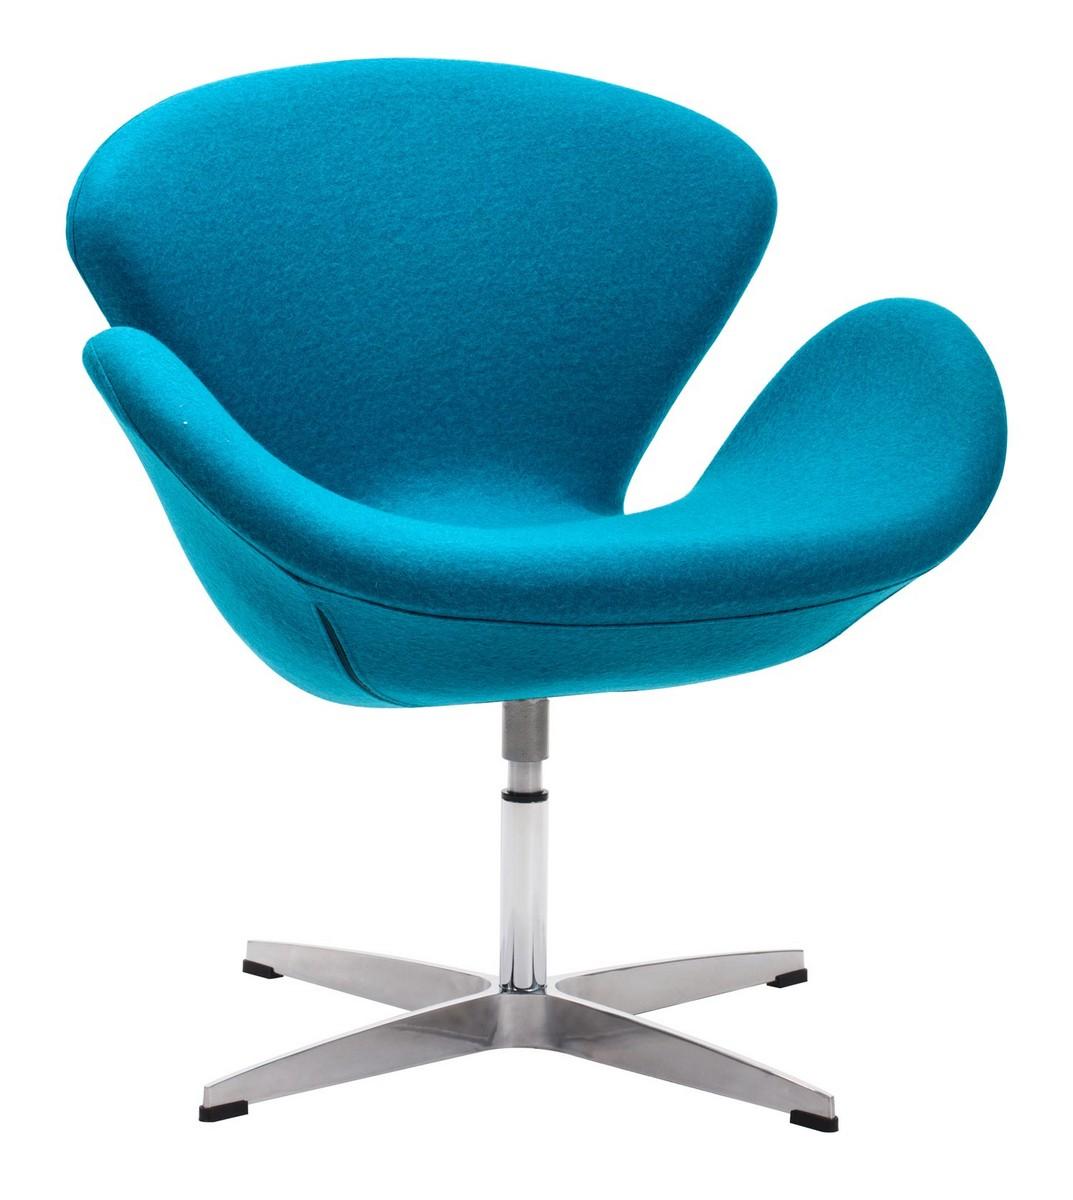 Zuo Modern Pori Occasional Chair - Island Blue